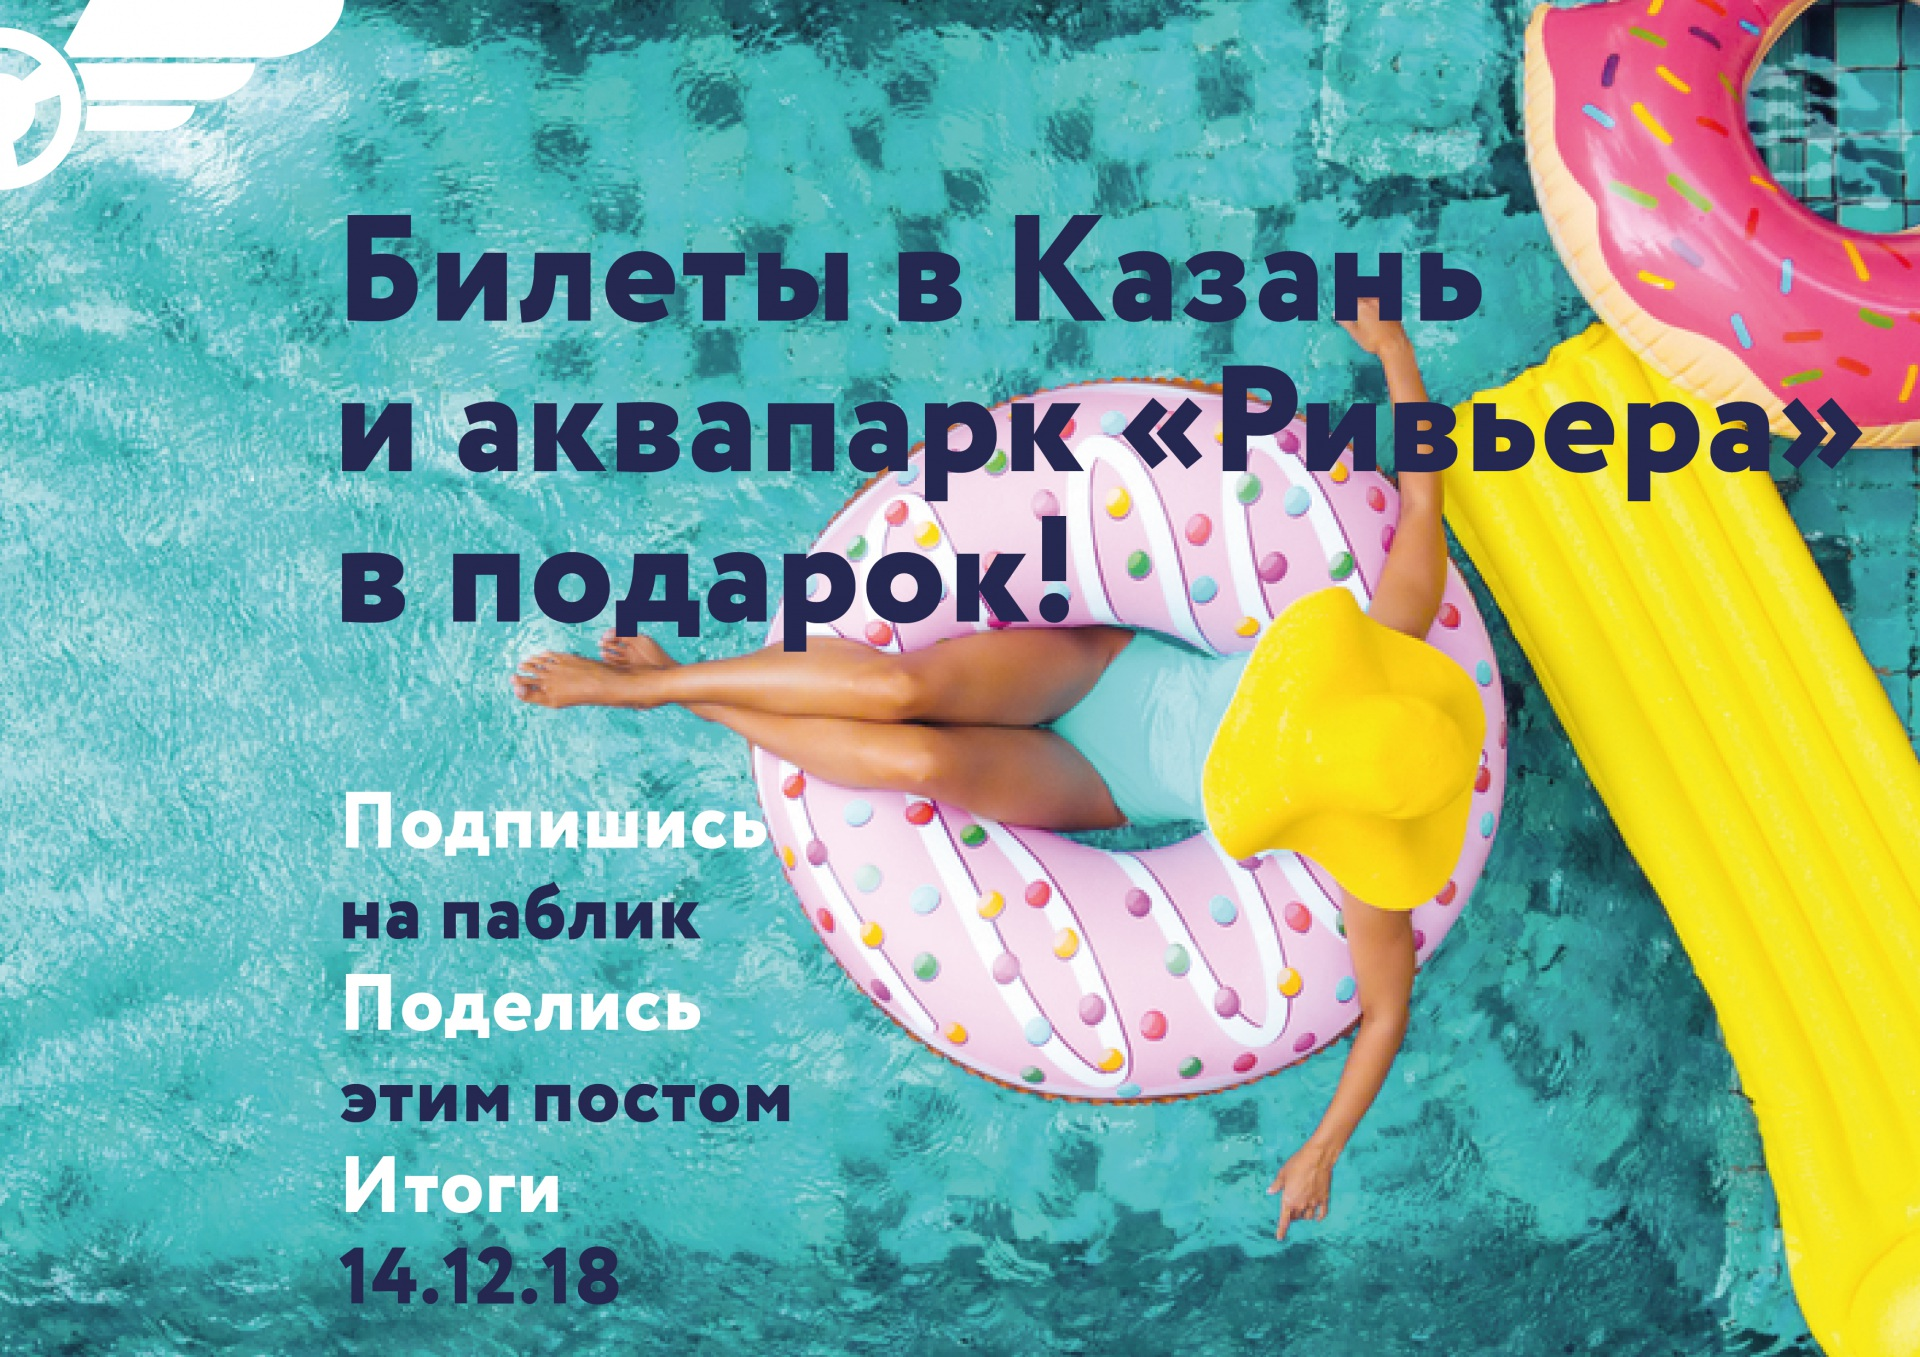 Post_Rozygrysch_NG-01.jpg